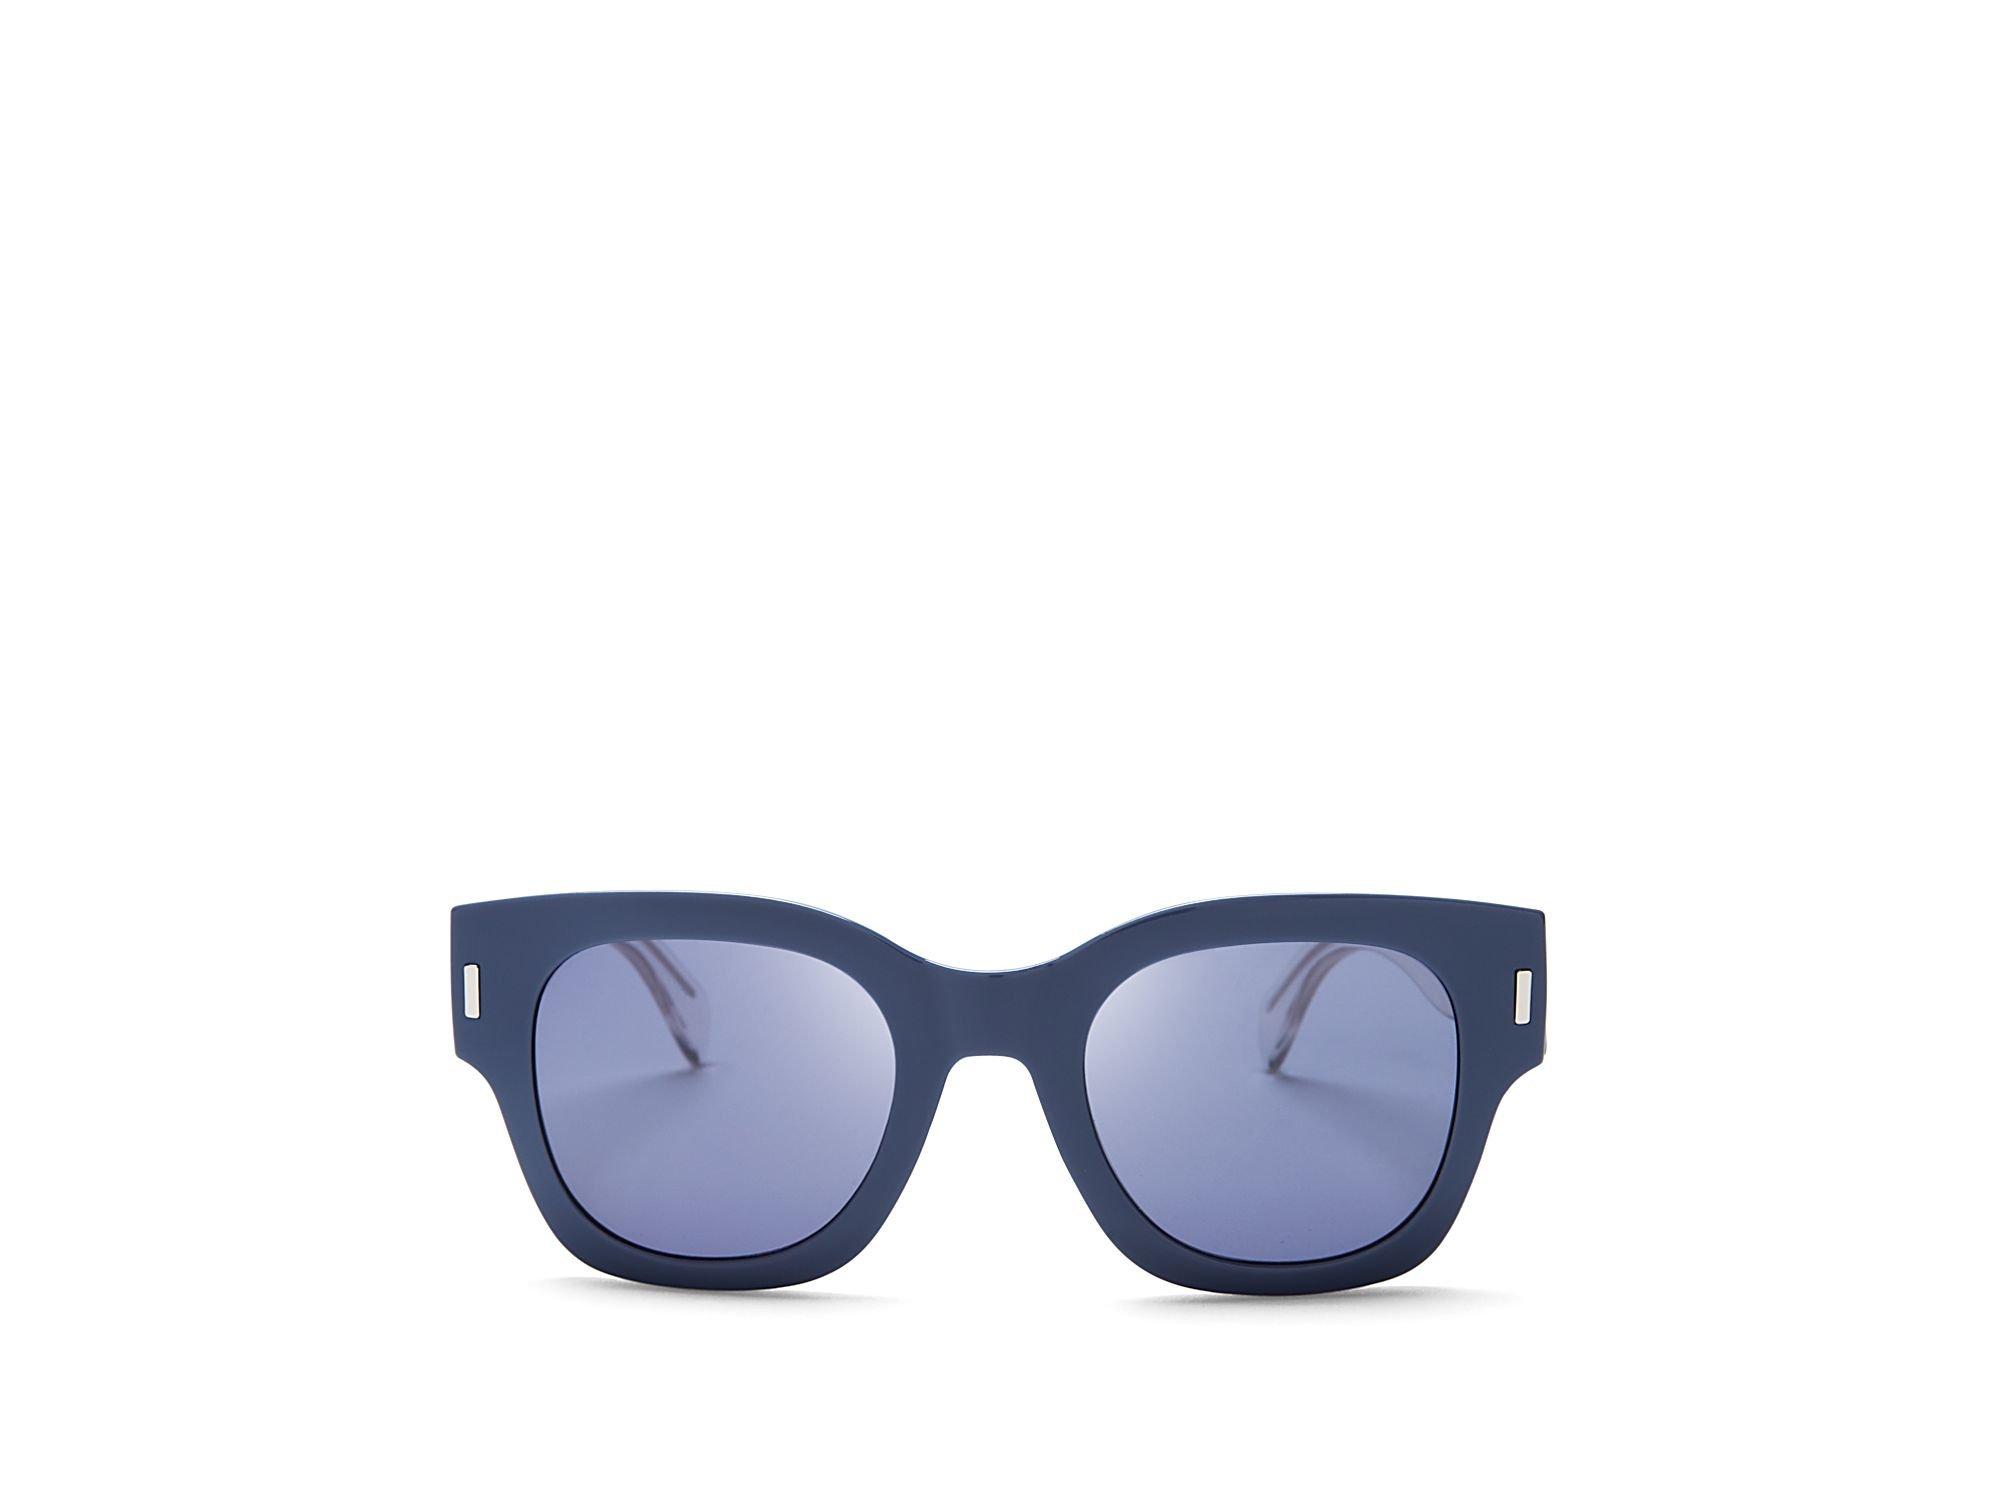 Mm Cat Eye Sunglasses Marc Jacobs